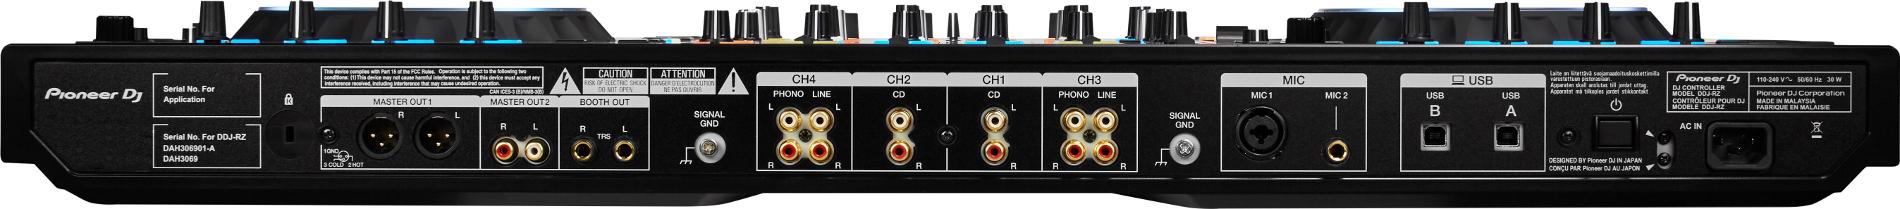 4-Channel Rekordbox DJ Controller